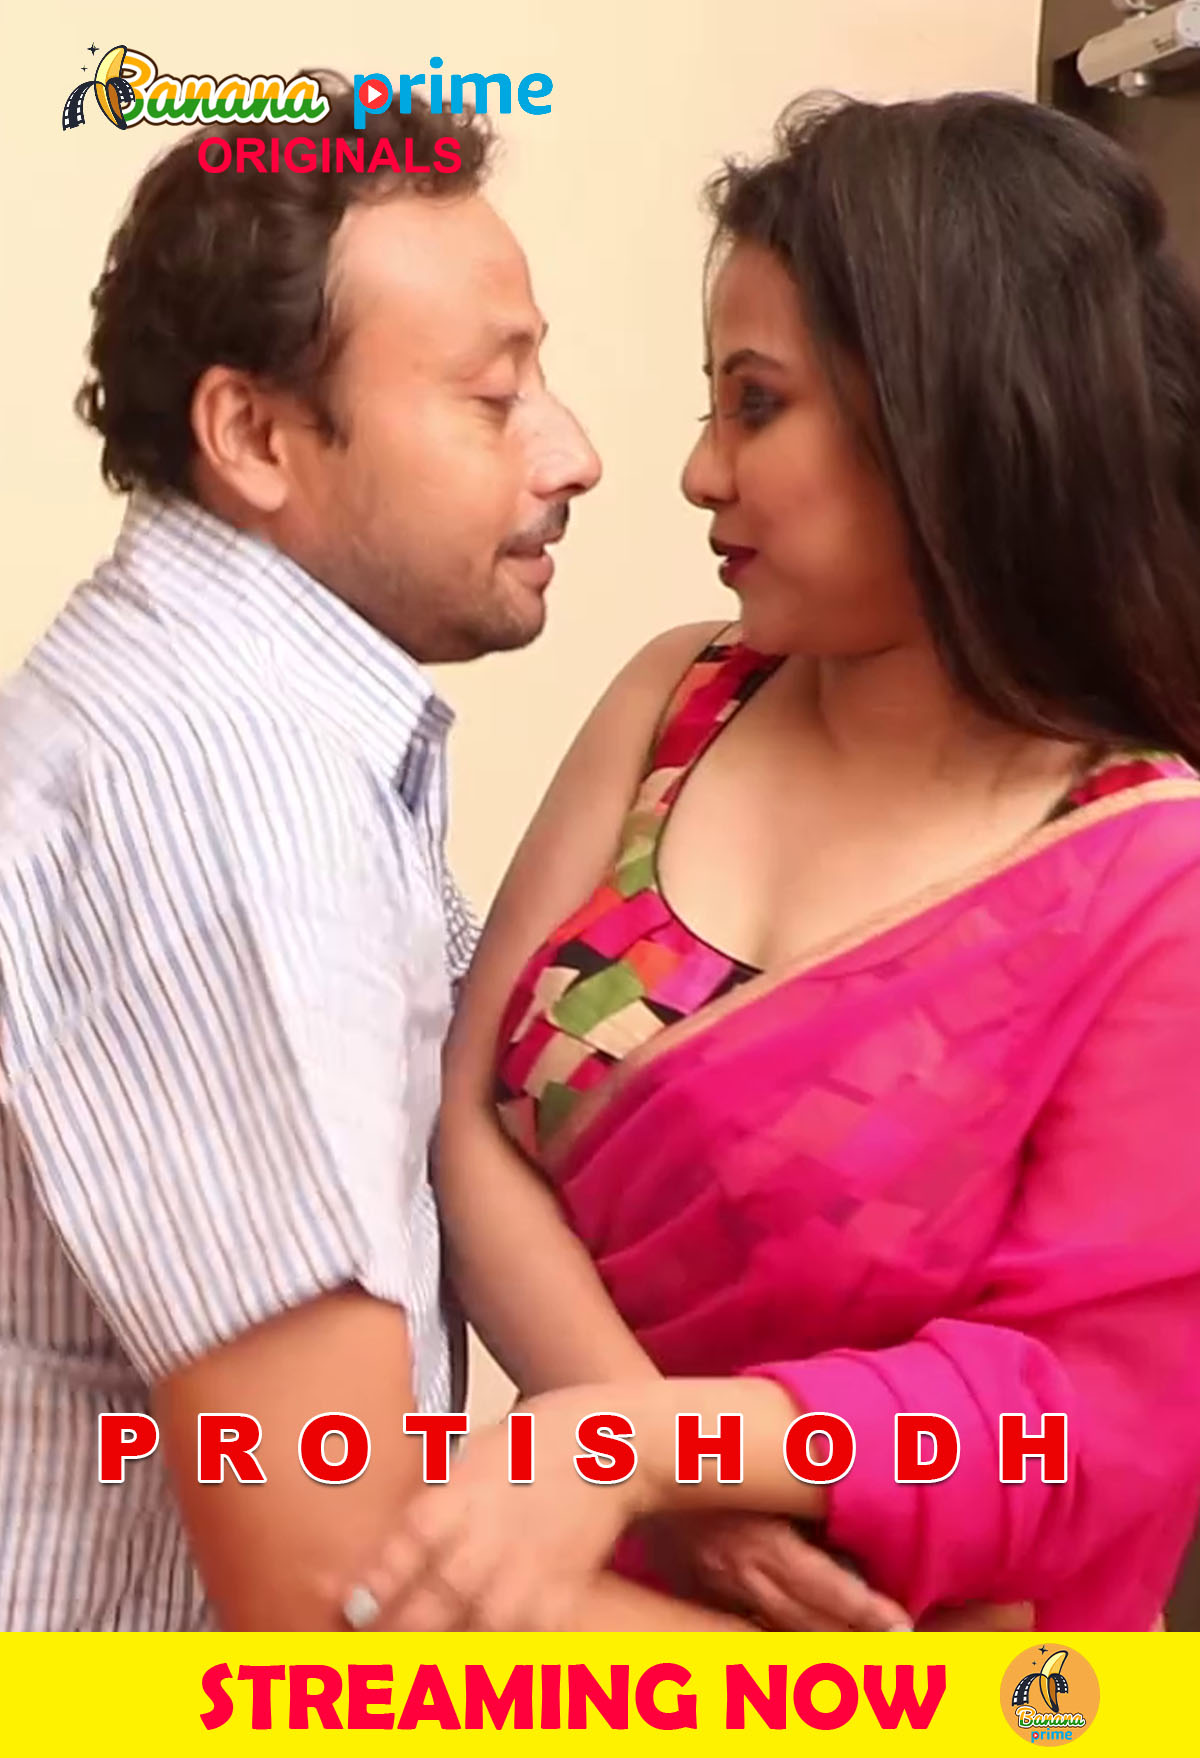 Protishodh 2020 BananaPrime Originals Bengali Short Film 720p HDRip 90MB Download